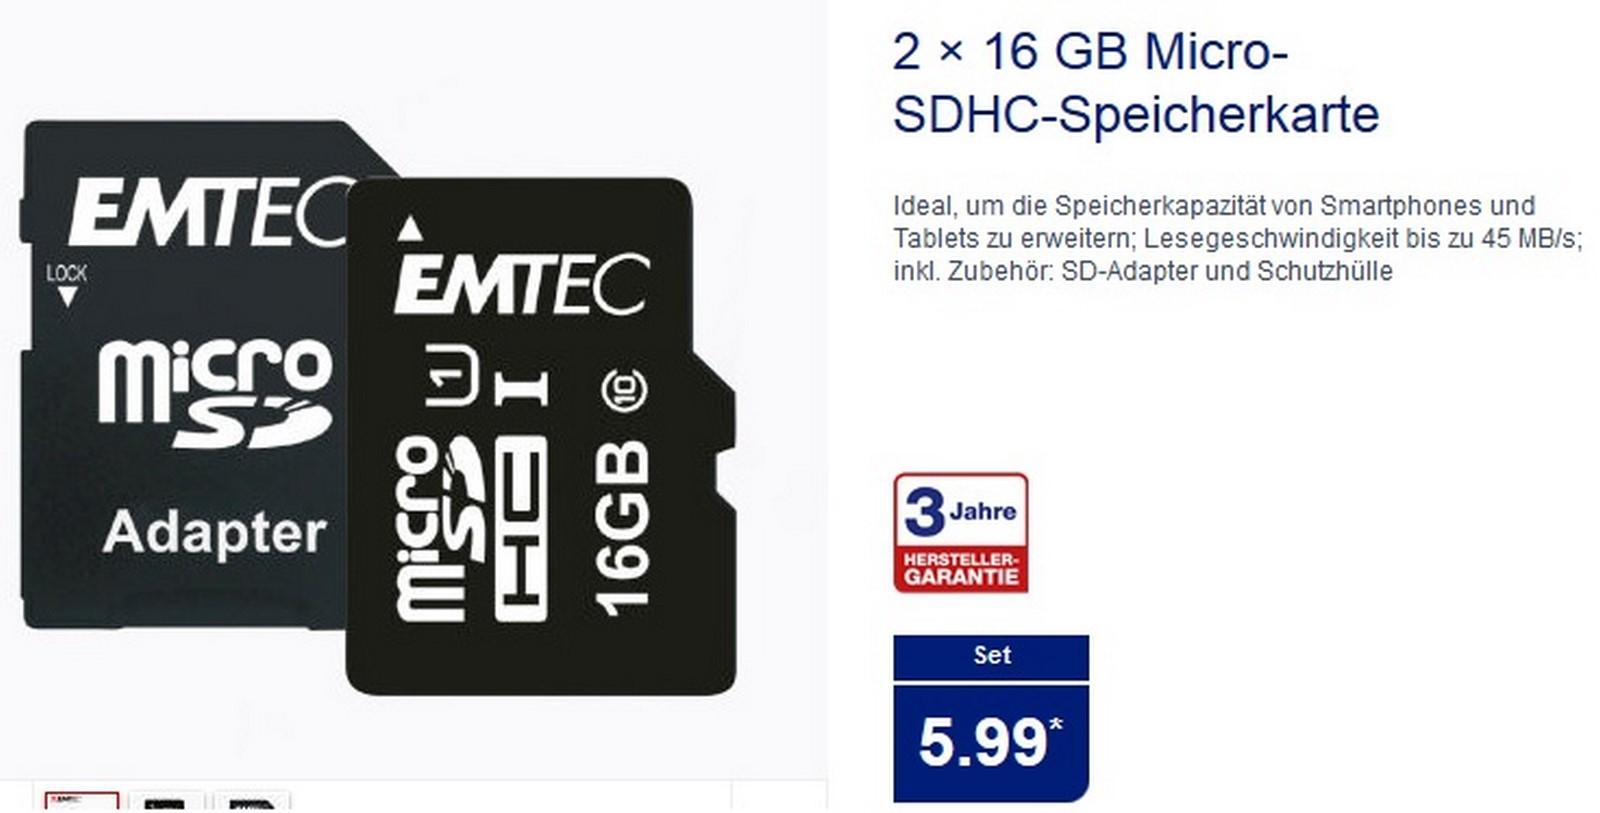 [Aldi-Nord] Ab 29.September Doppelpack 16GB Micro-SDHC EMTEC Speicherkarten Inkl. Adapter, UHS-1 Class 10 für 5,99€